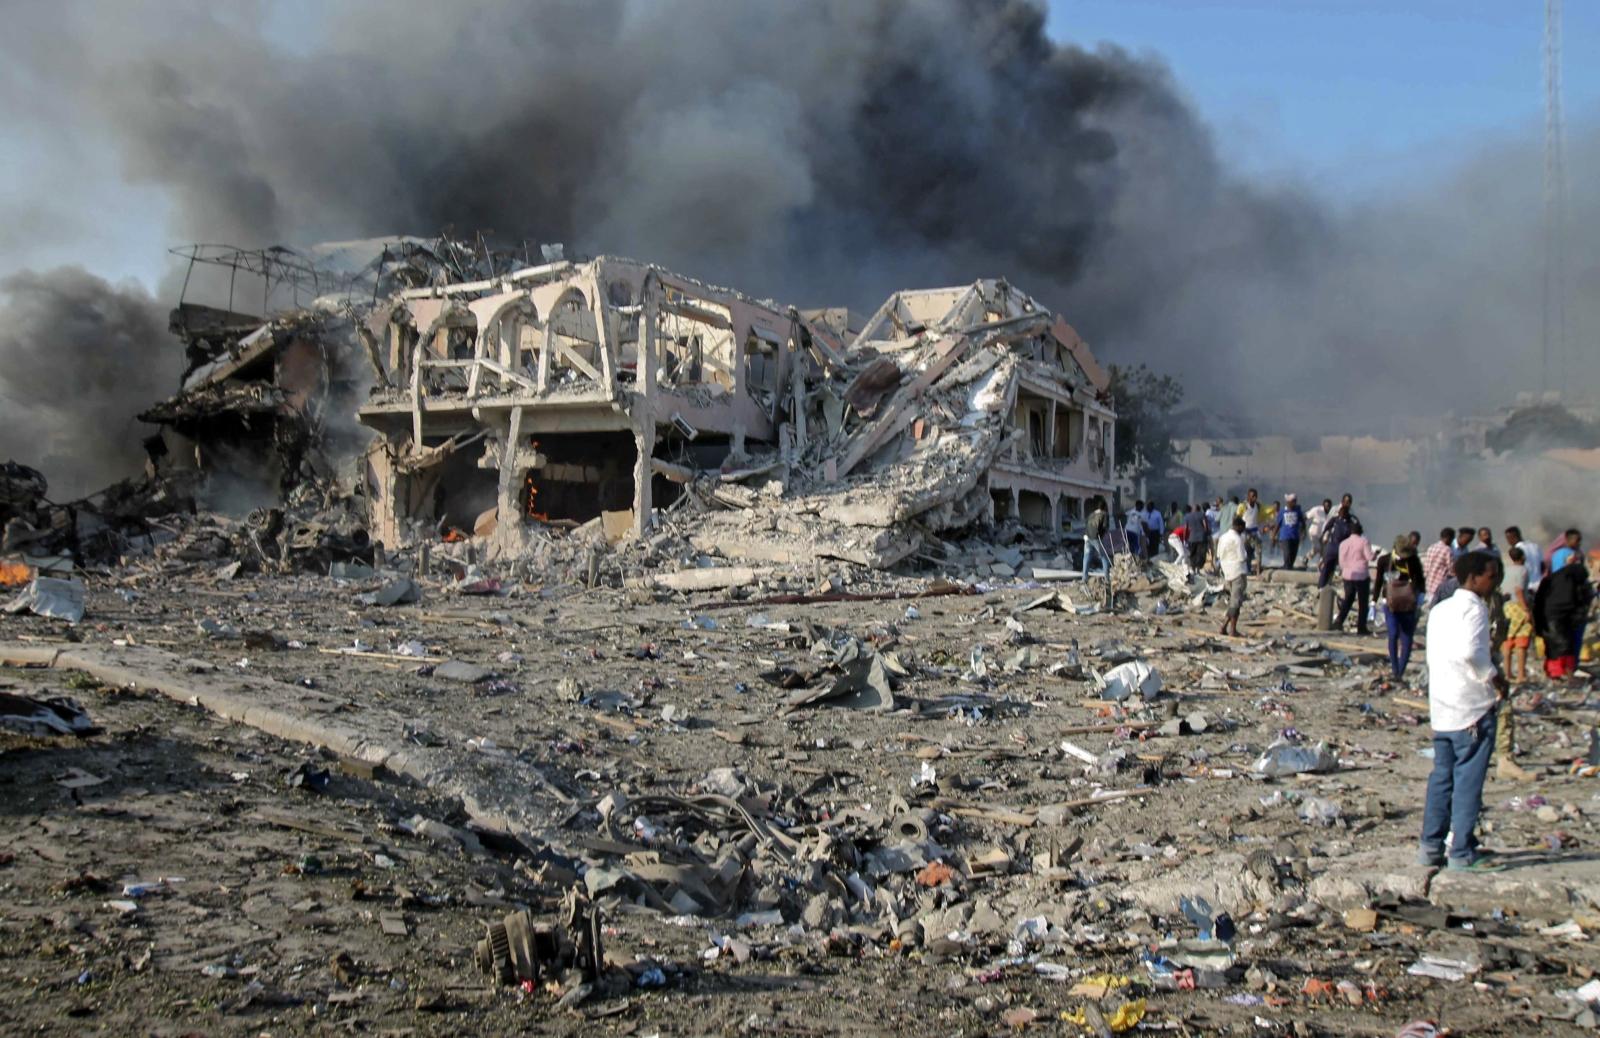 Zamach bombowy w Somalii   EPA/SAID YUSUF WARSAME